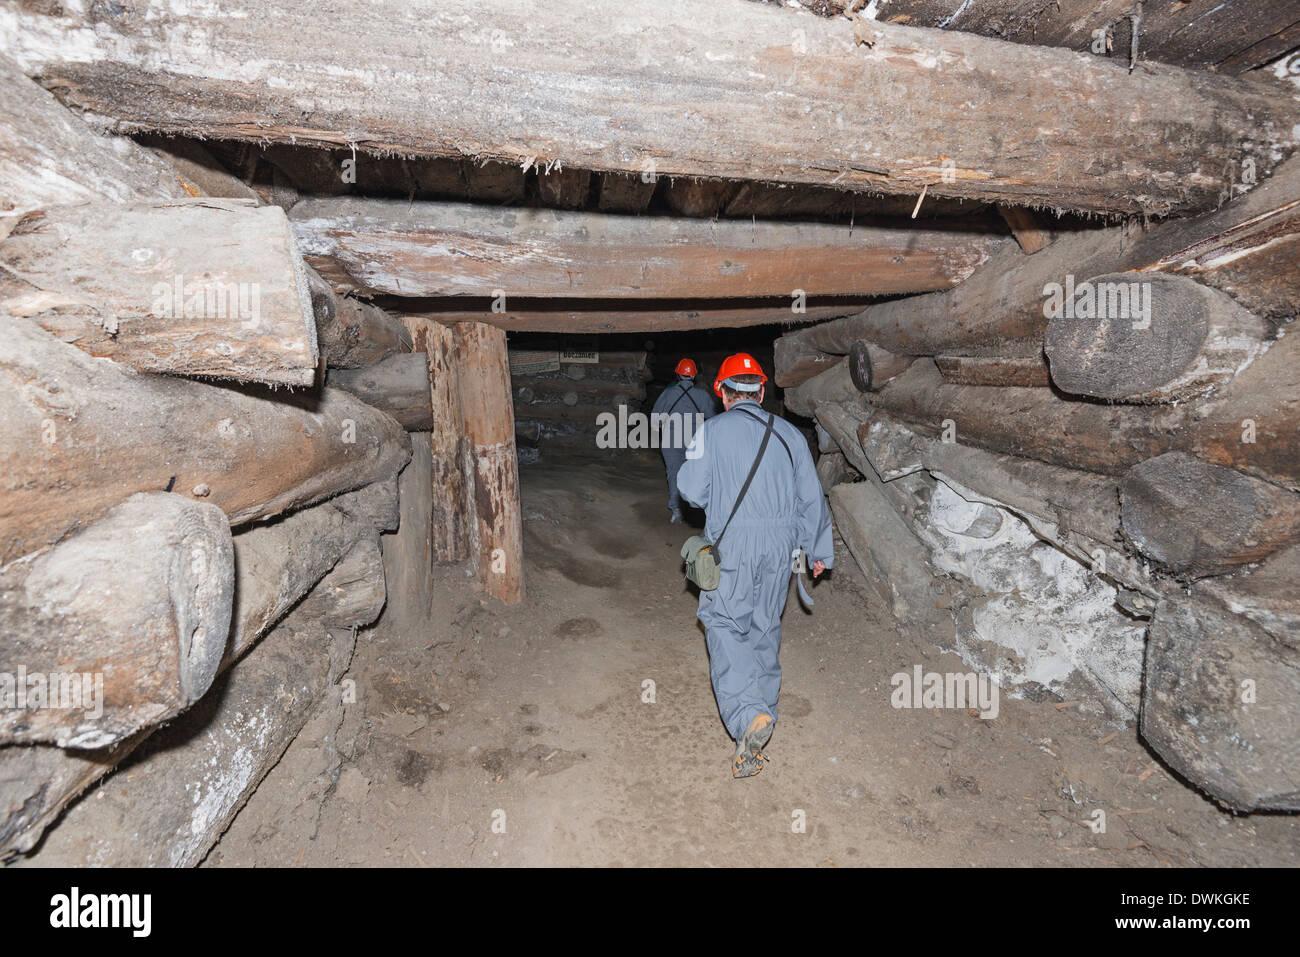 Miners route, Wieliczka Salt Mine, UNESCO World Heritage Site, Krakow, Malopolska, Poland, Europe - Stock Image